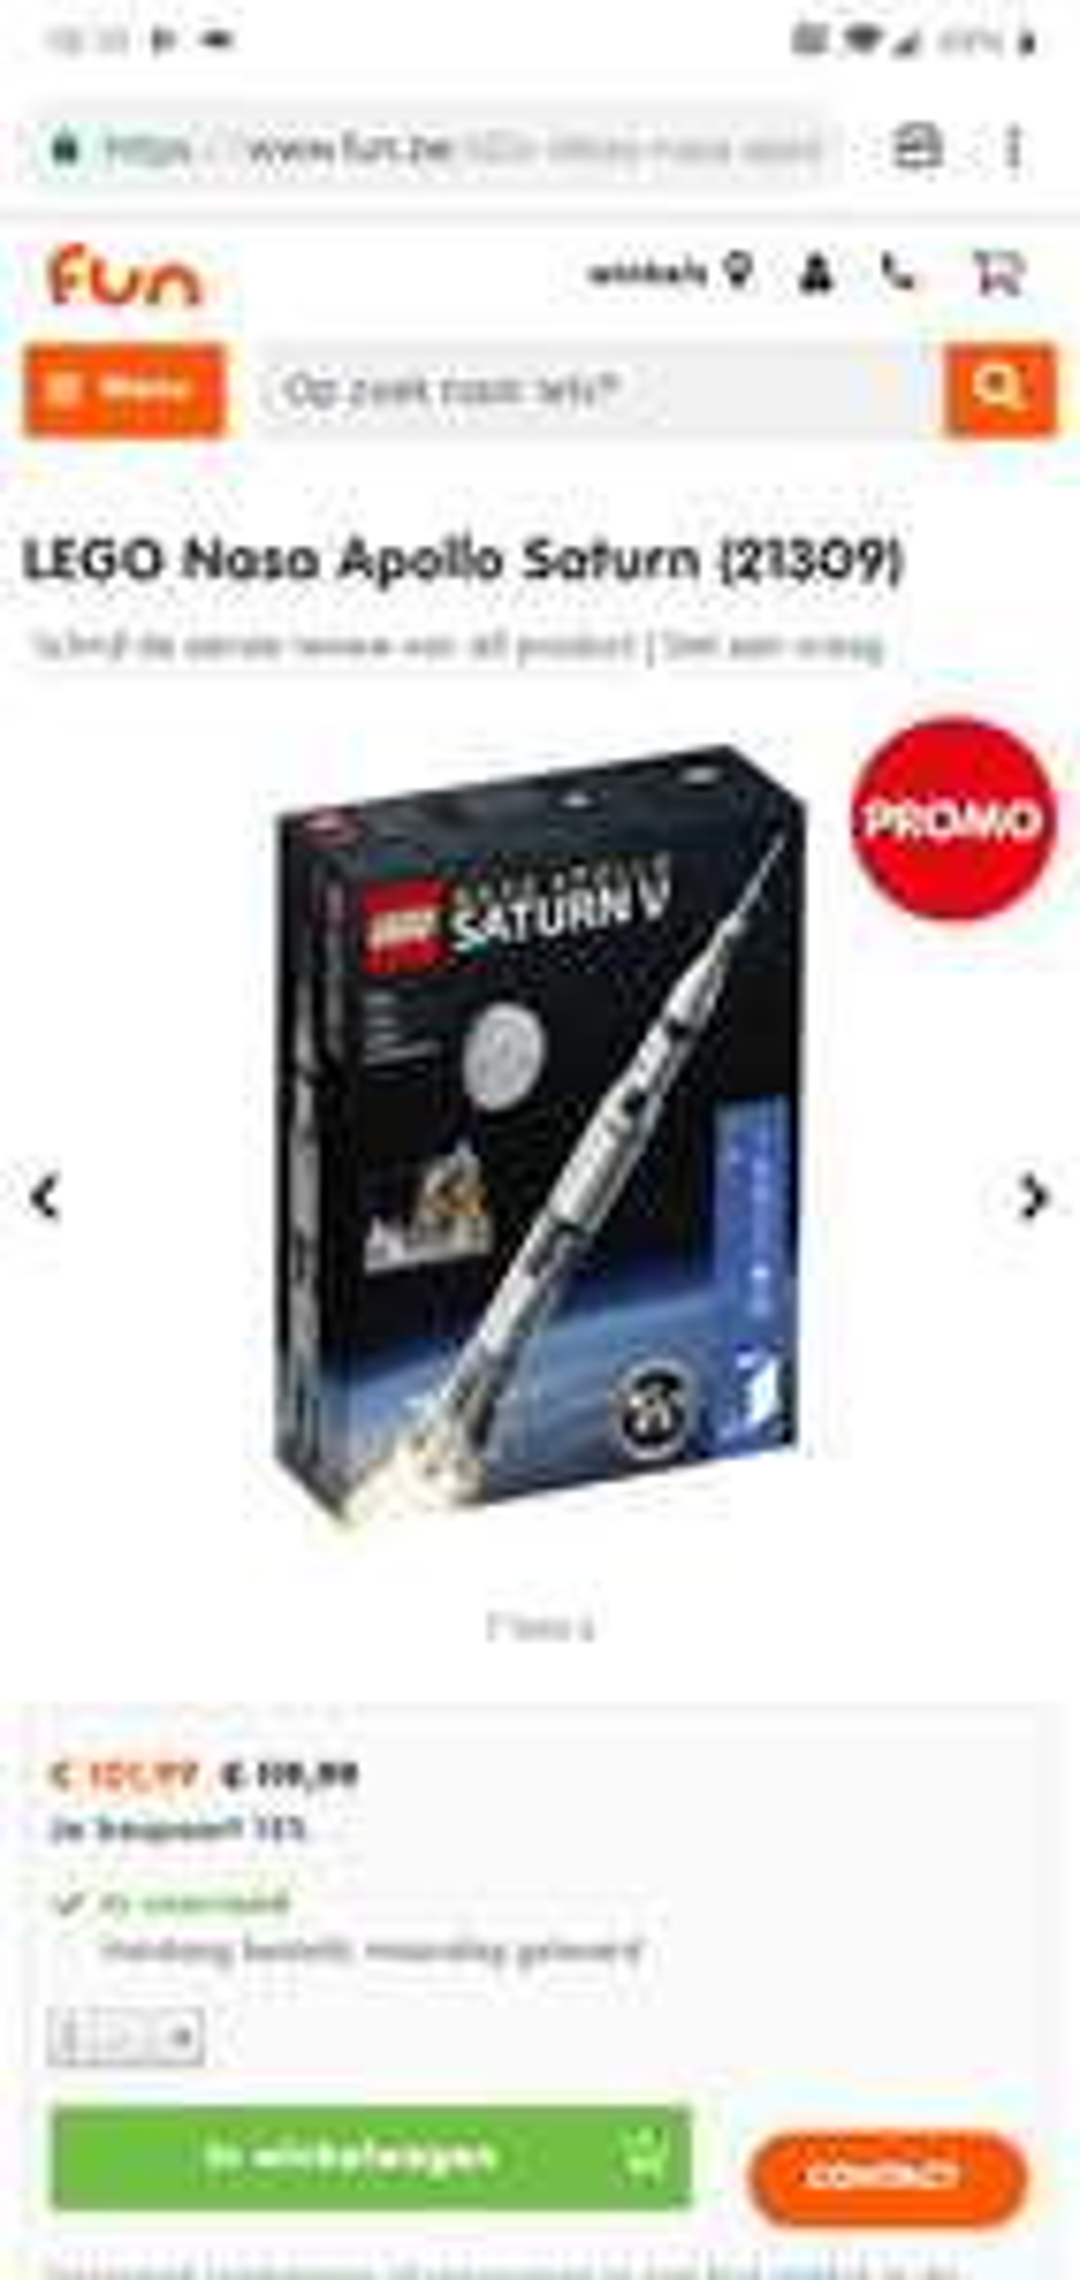 LEGO 15% korting Fun.be (ook NASA Saturn V)